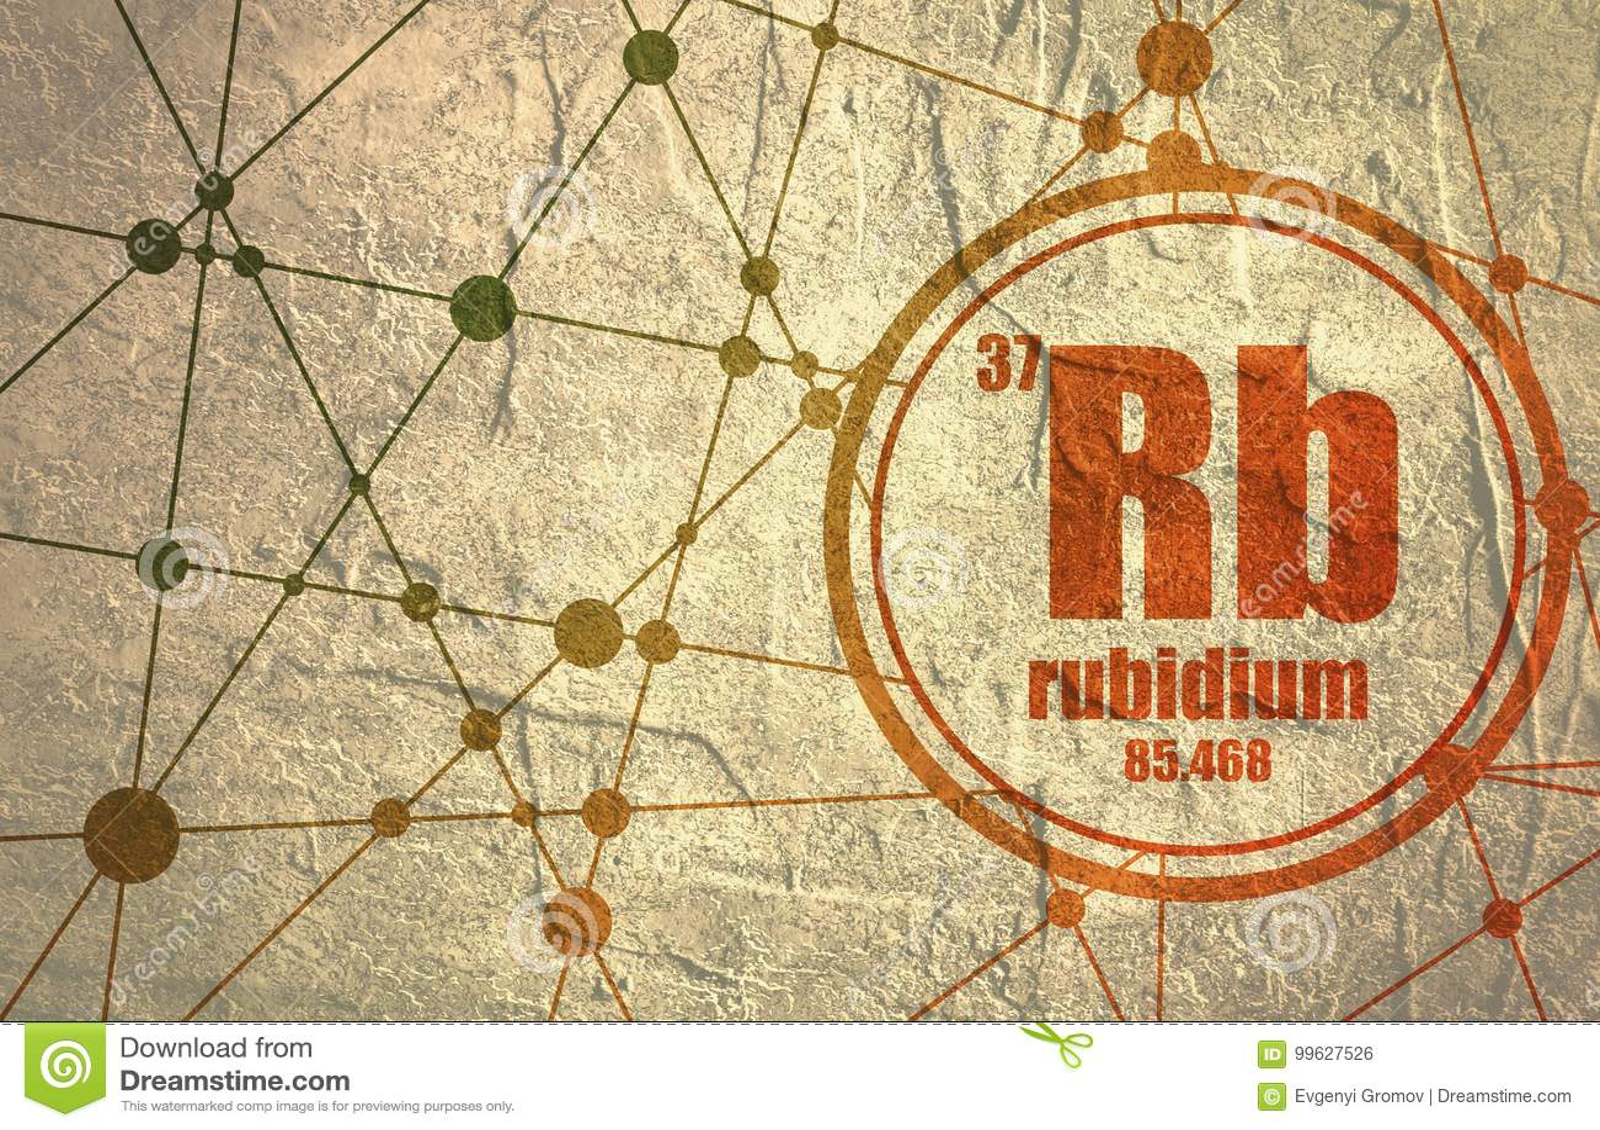 Rubidium Chemical Element Stock Illustration Illustration Of